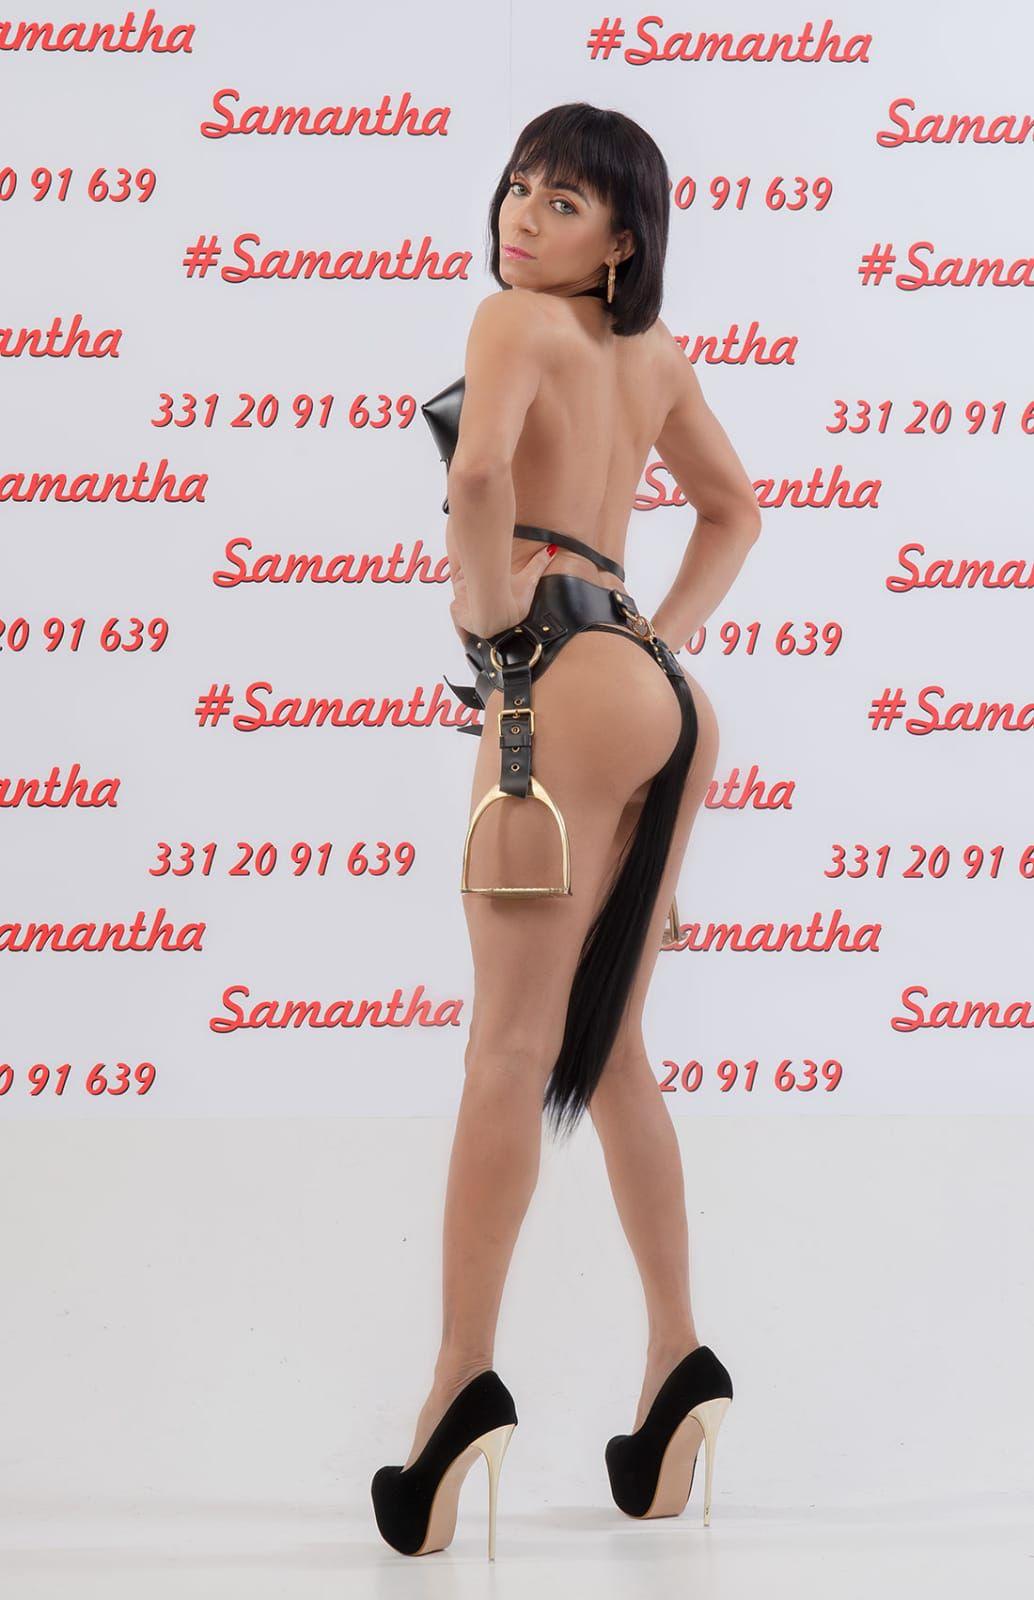 Samantha cerca relazioni Trans Udine